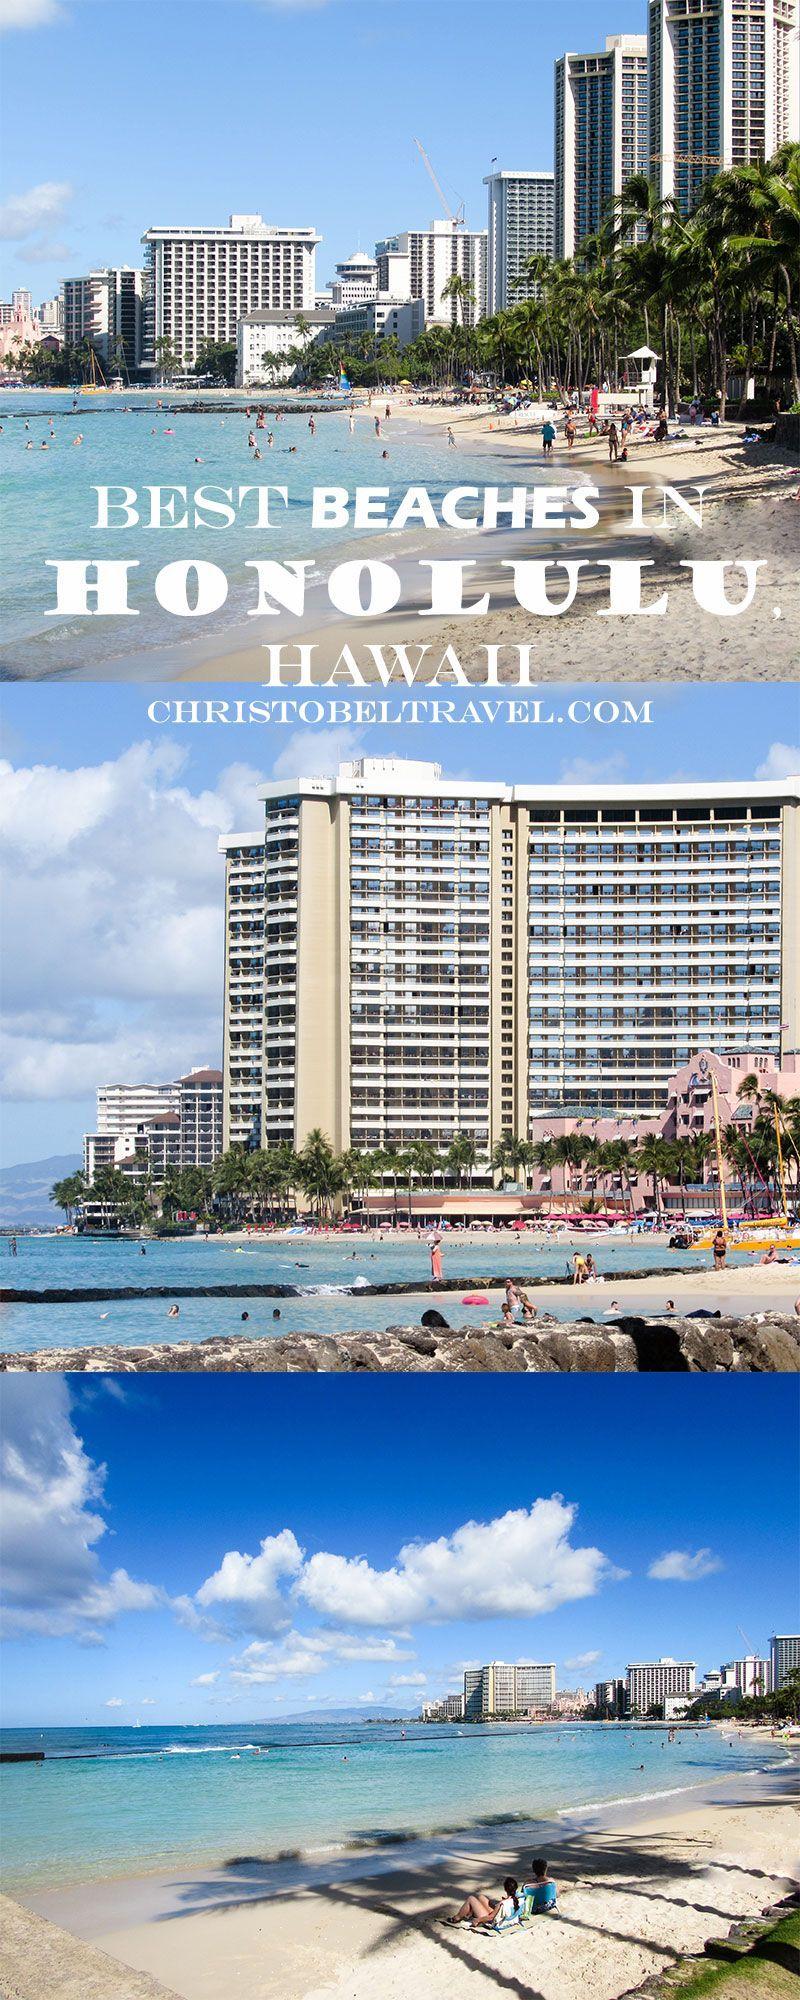 45 Things To Do In Honolulu Oahu Hawaii Travel Guide Itinerary